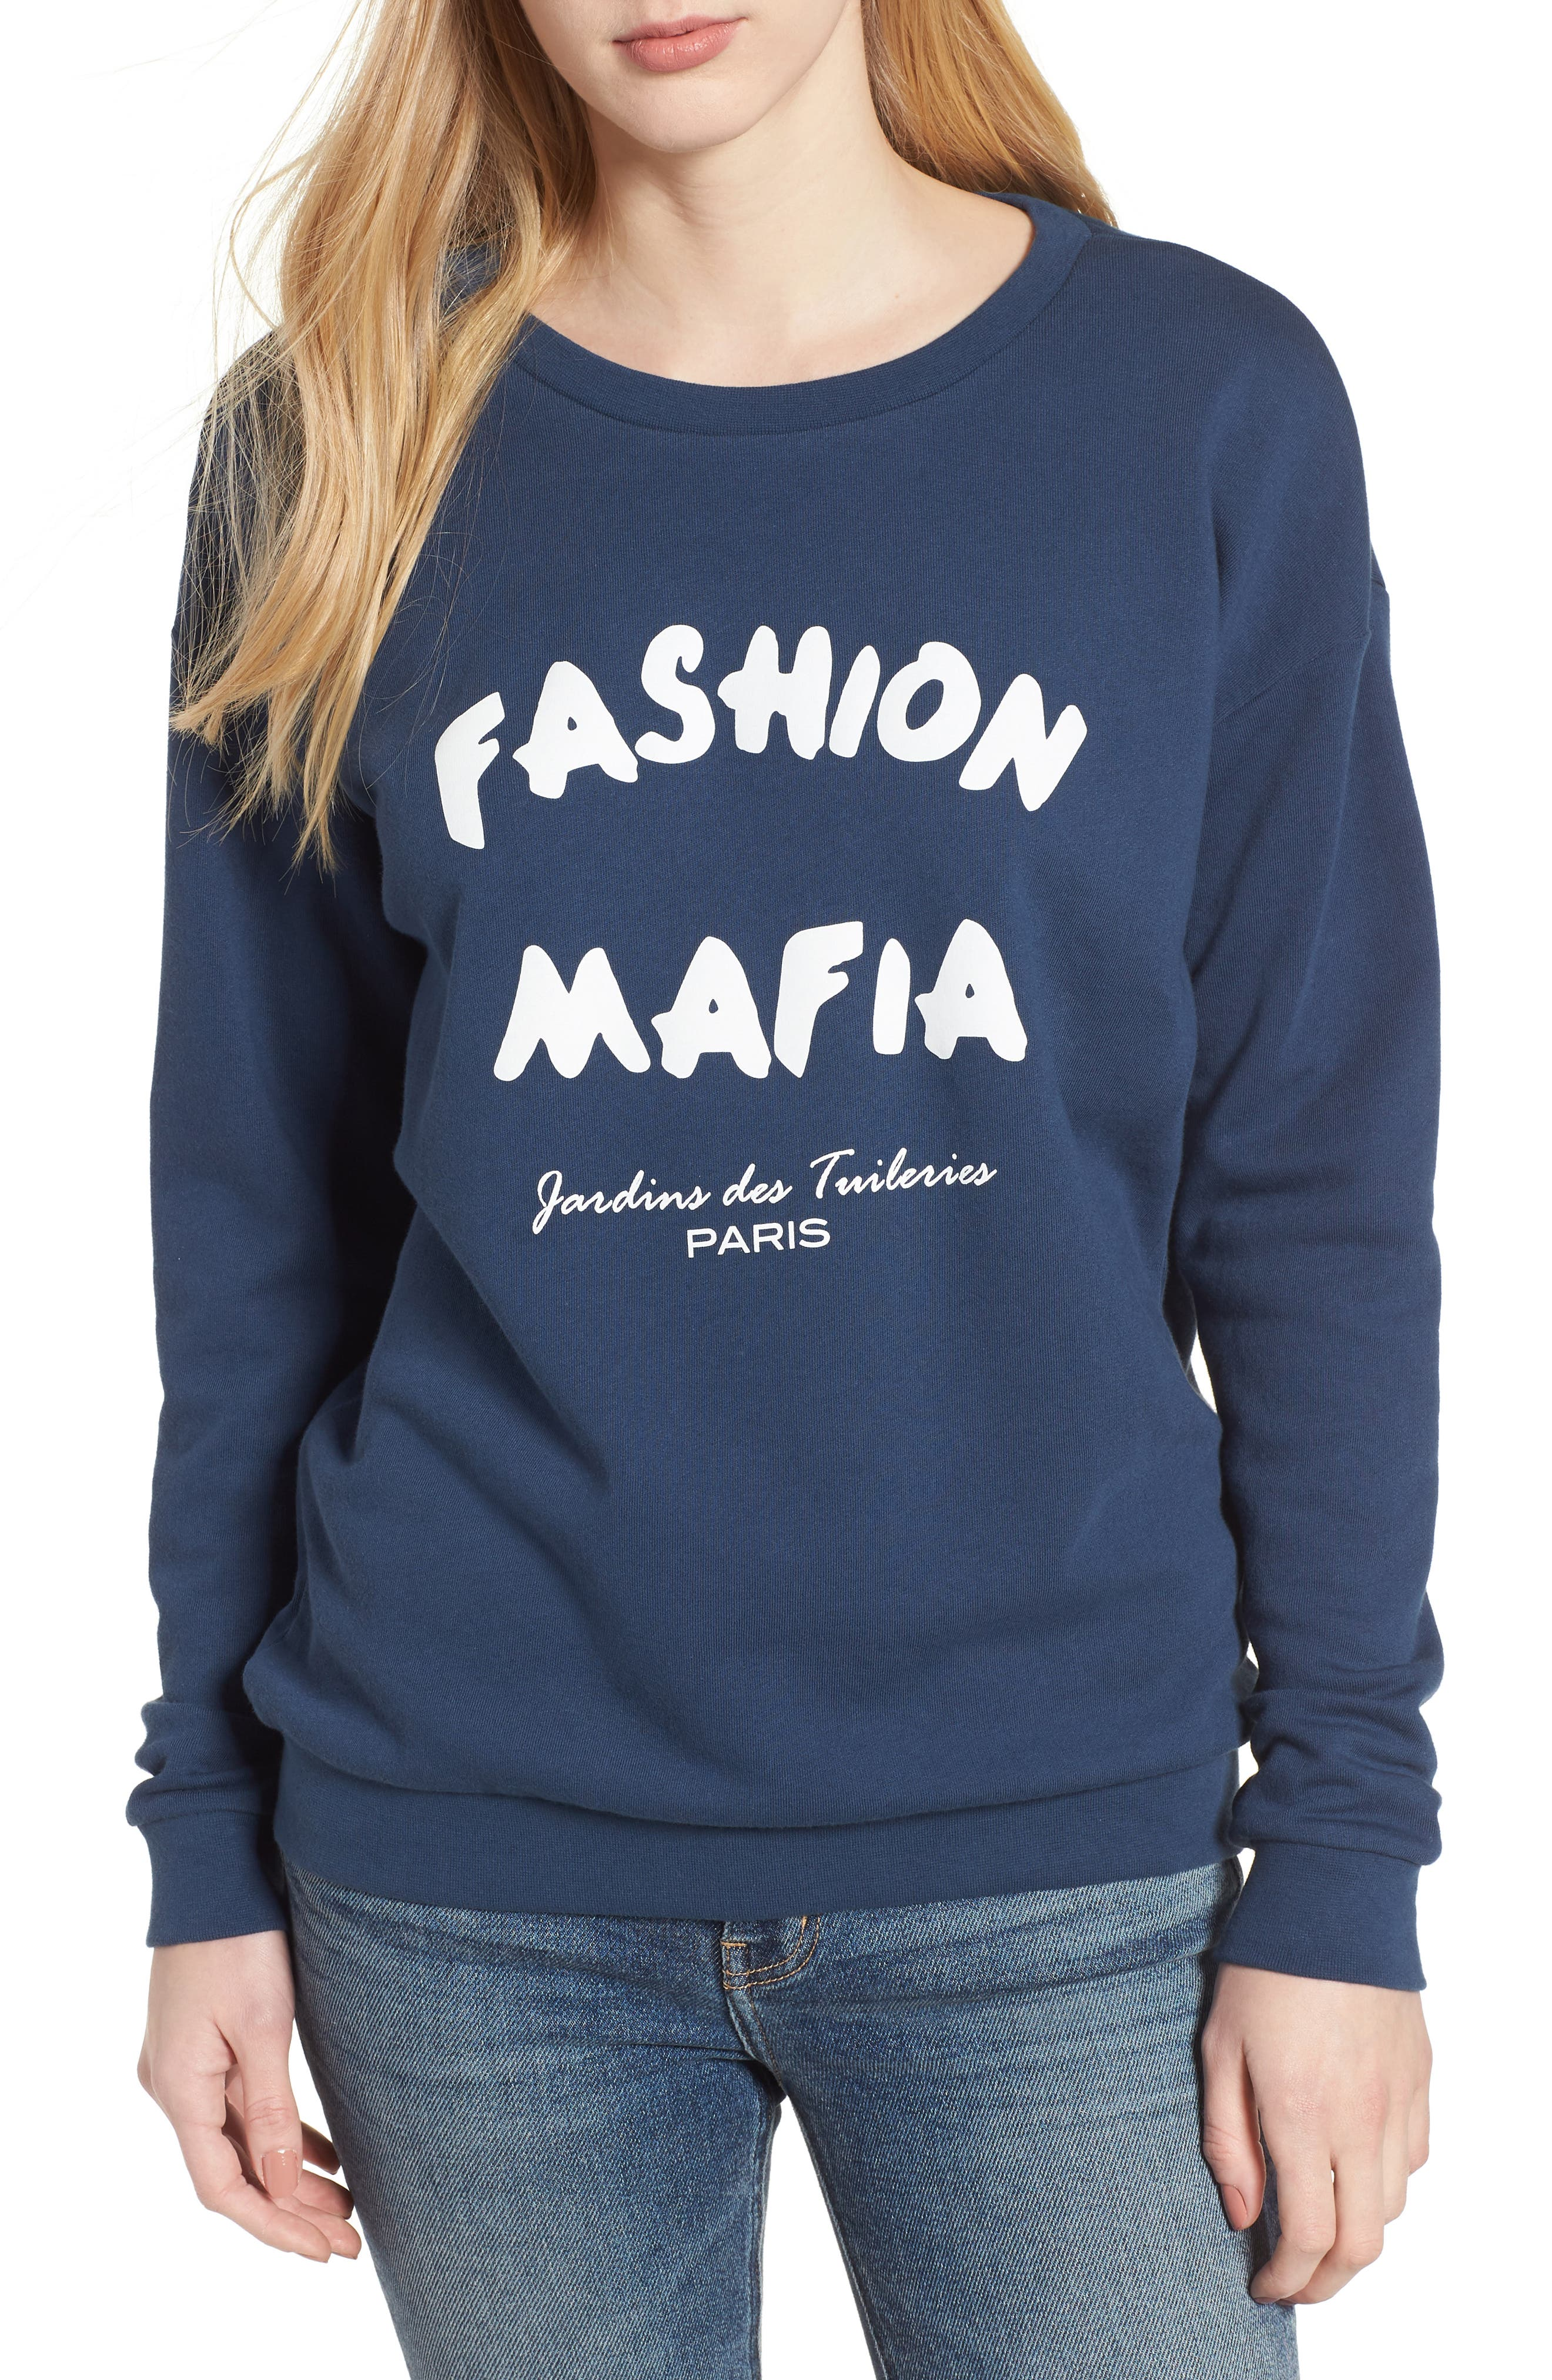 South Parade Alexa - Fashion Mafia Sweatshirt